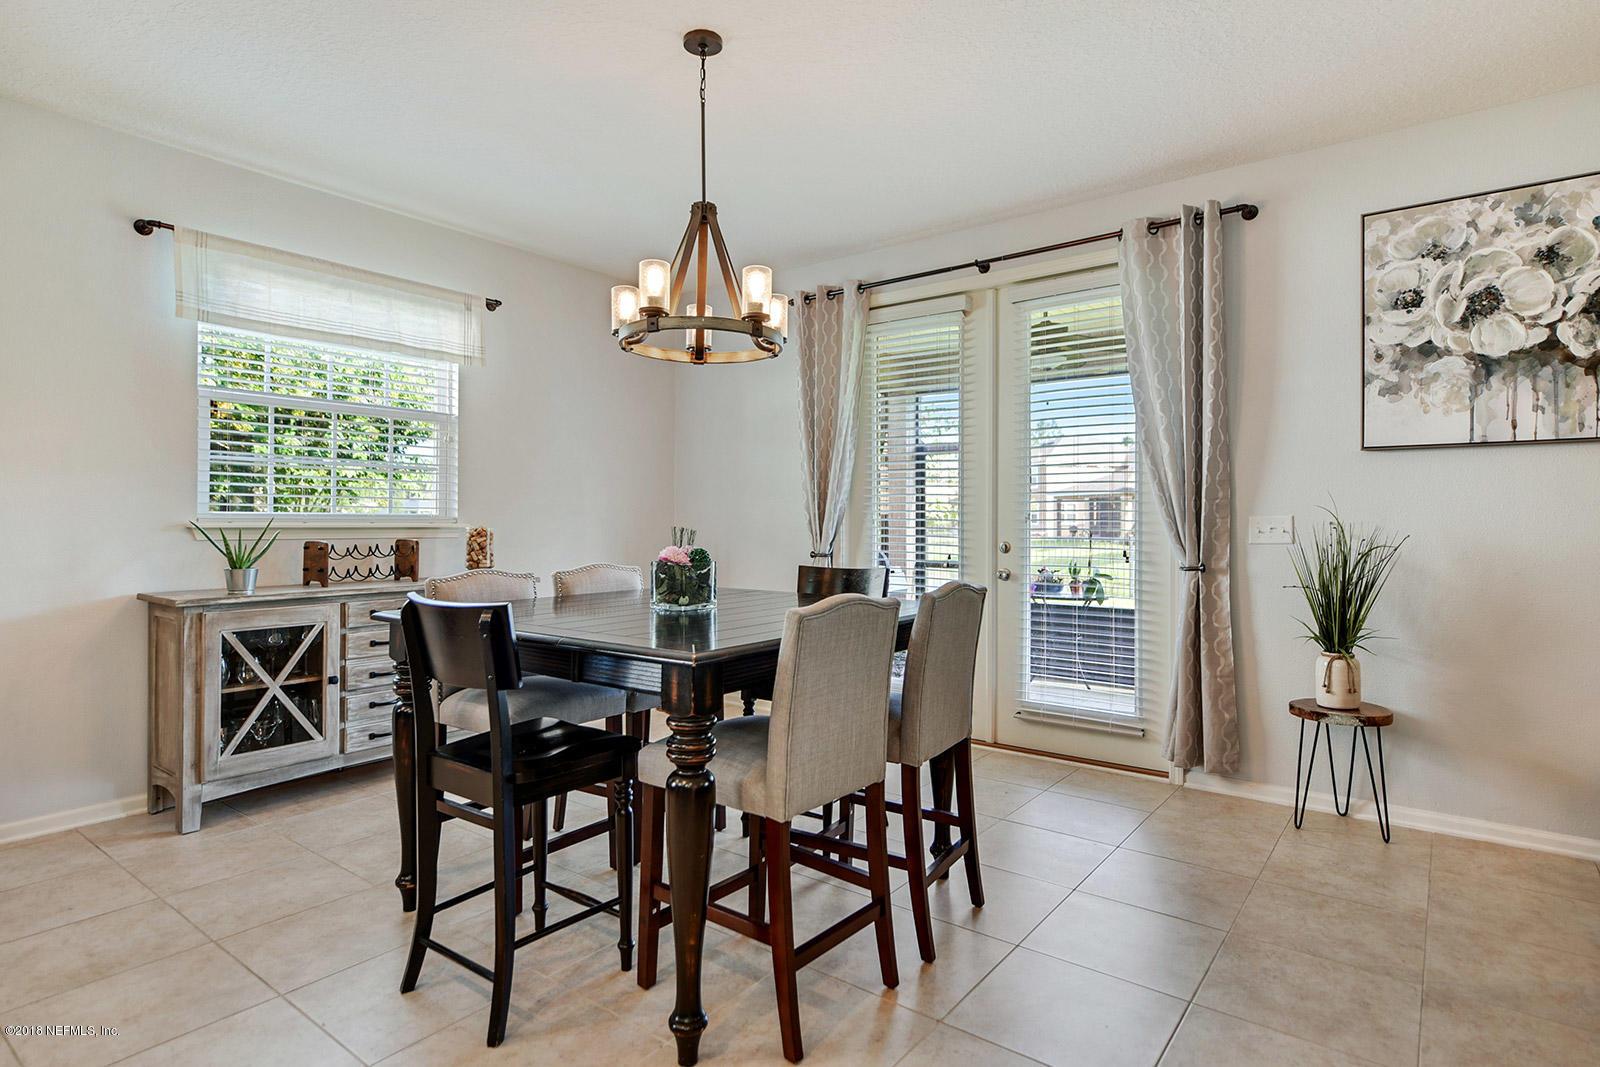 4580 GOLF BROOK, ORANGE PARK, FLORIDA 32065, 4 Bedrooms Bedrooms, ,3 BathroomsBathrooms,Residential - single family,For sale,GOLF BROOK,949526